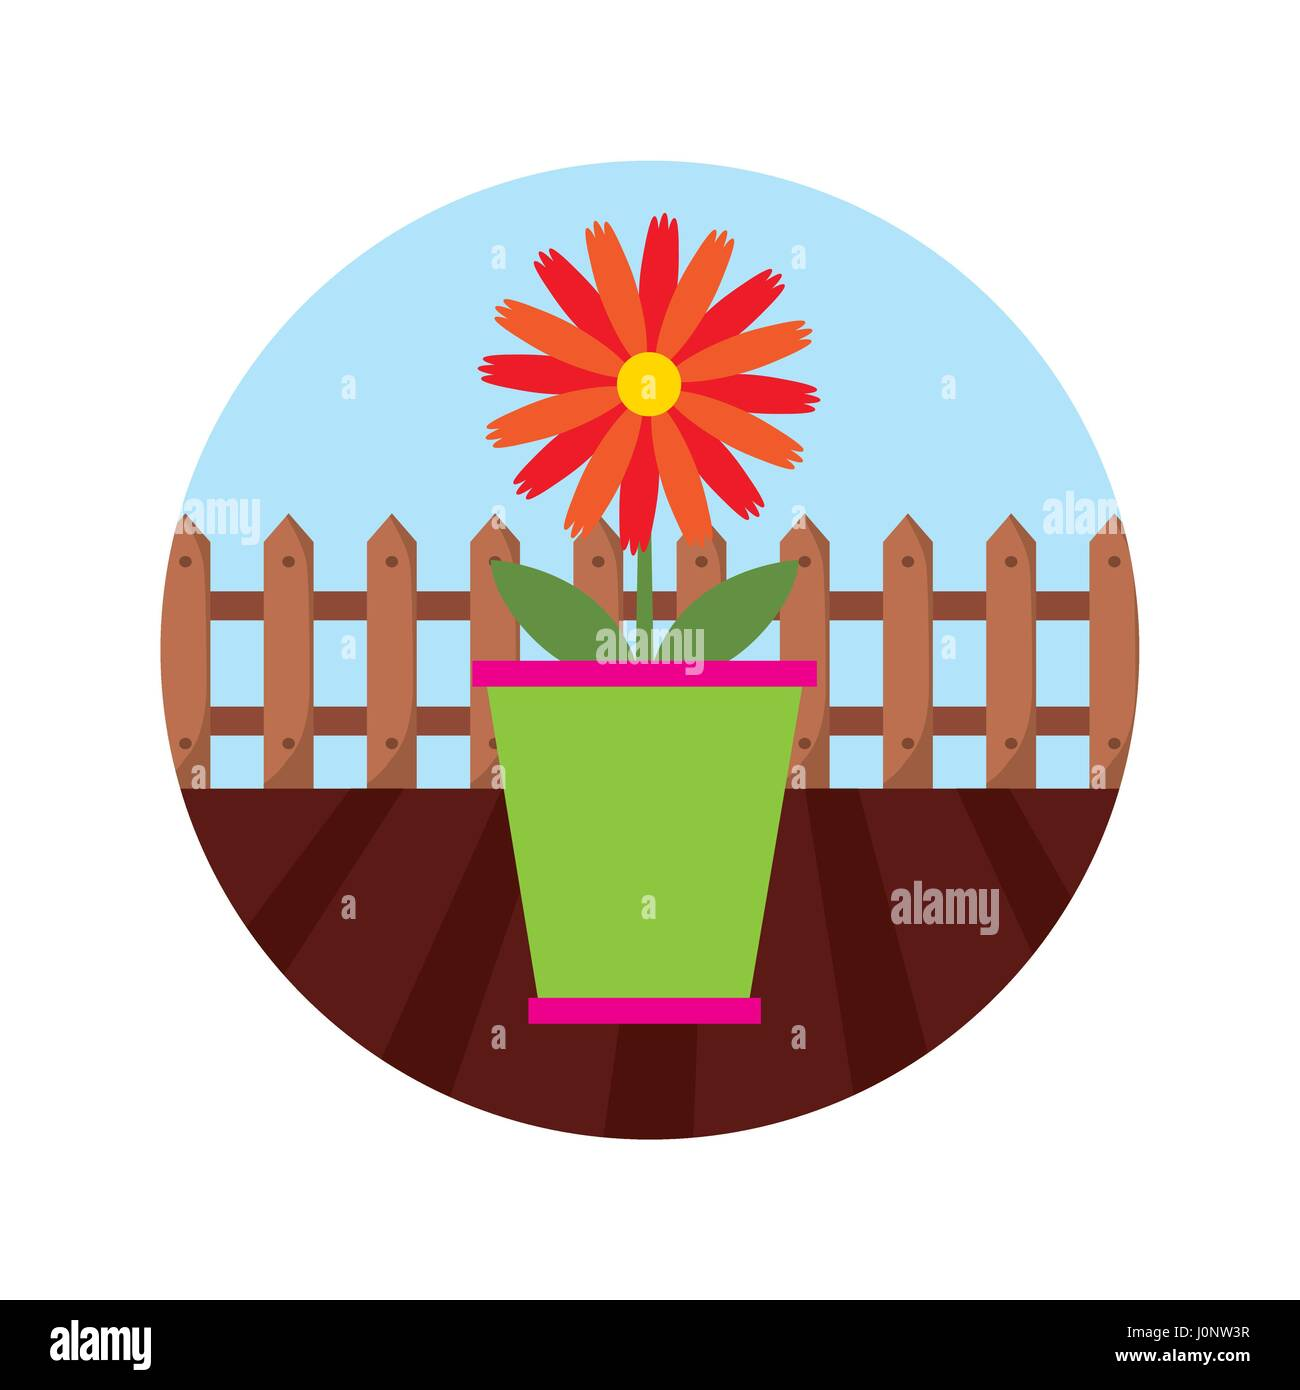 Cartoon daisy flower image cut out stock images pictures alamy cartoon daisy flower image htgc61 rf beautiful garden flat icons stock image izmirmasajfo